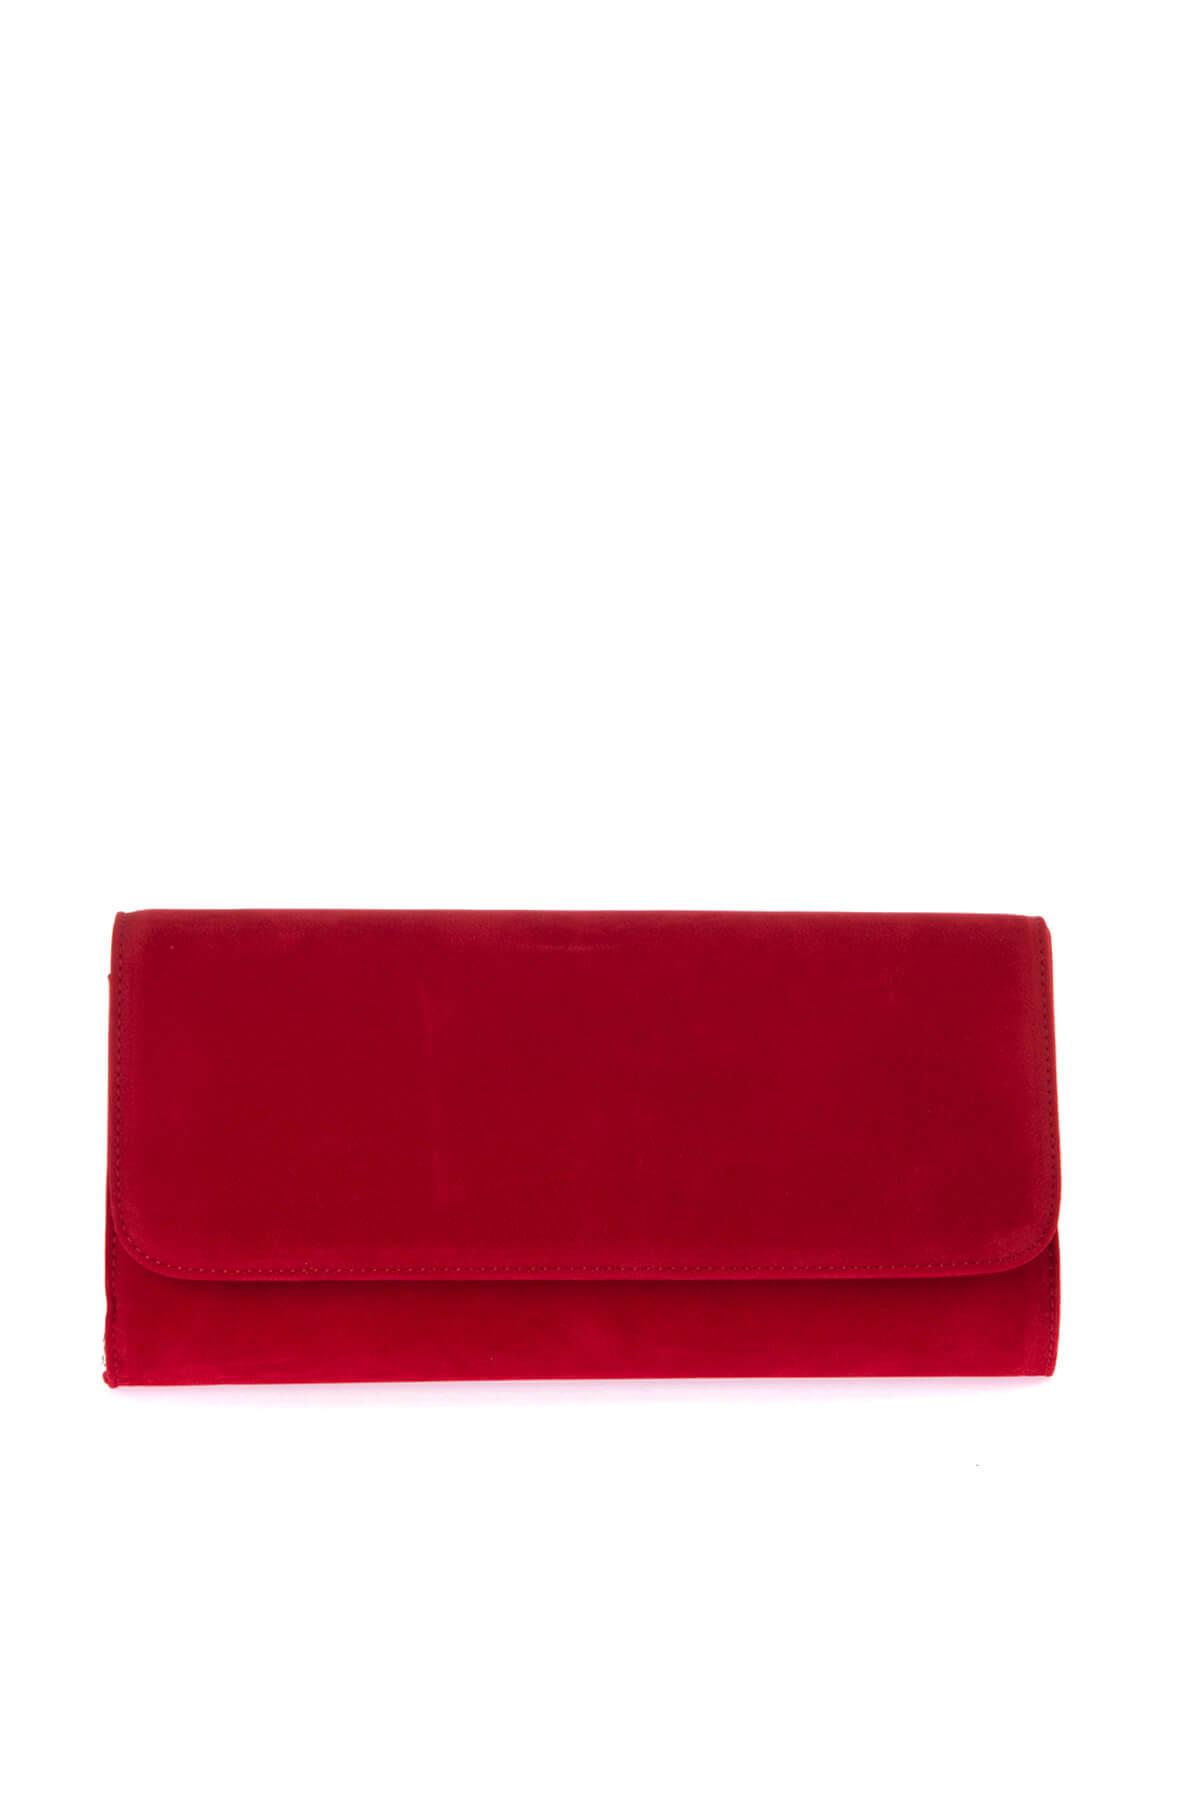 Kırmızı Kadın Portföy Çanta C0112-18